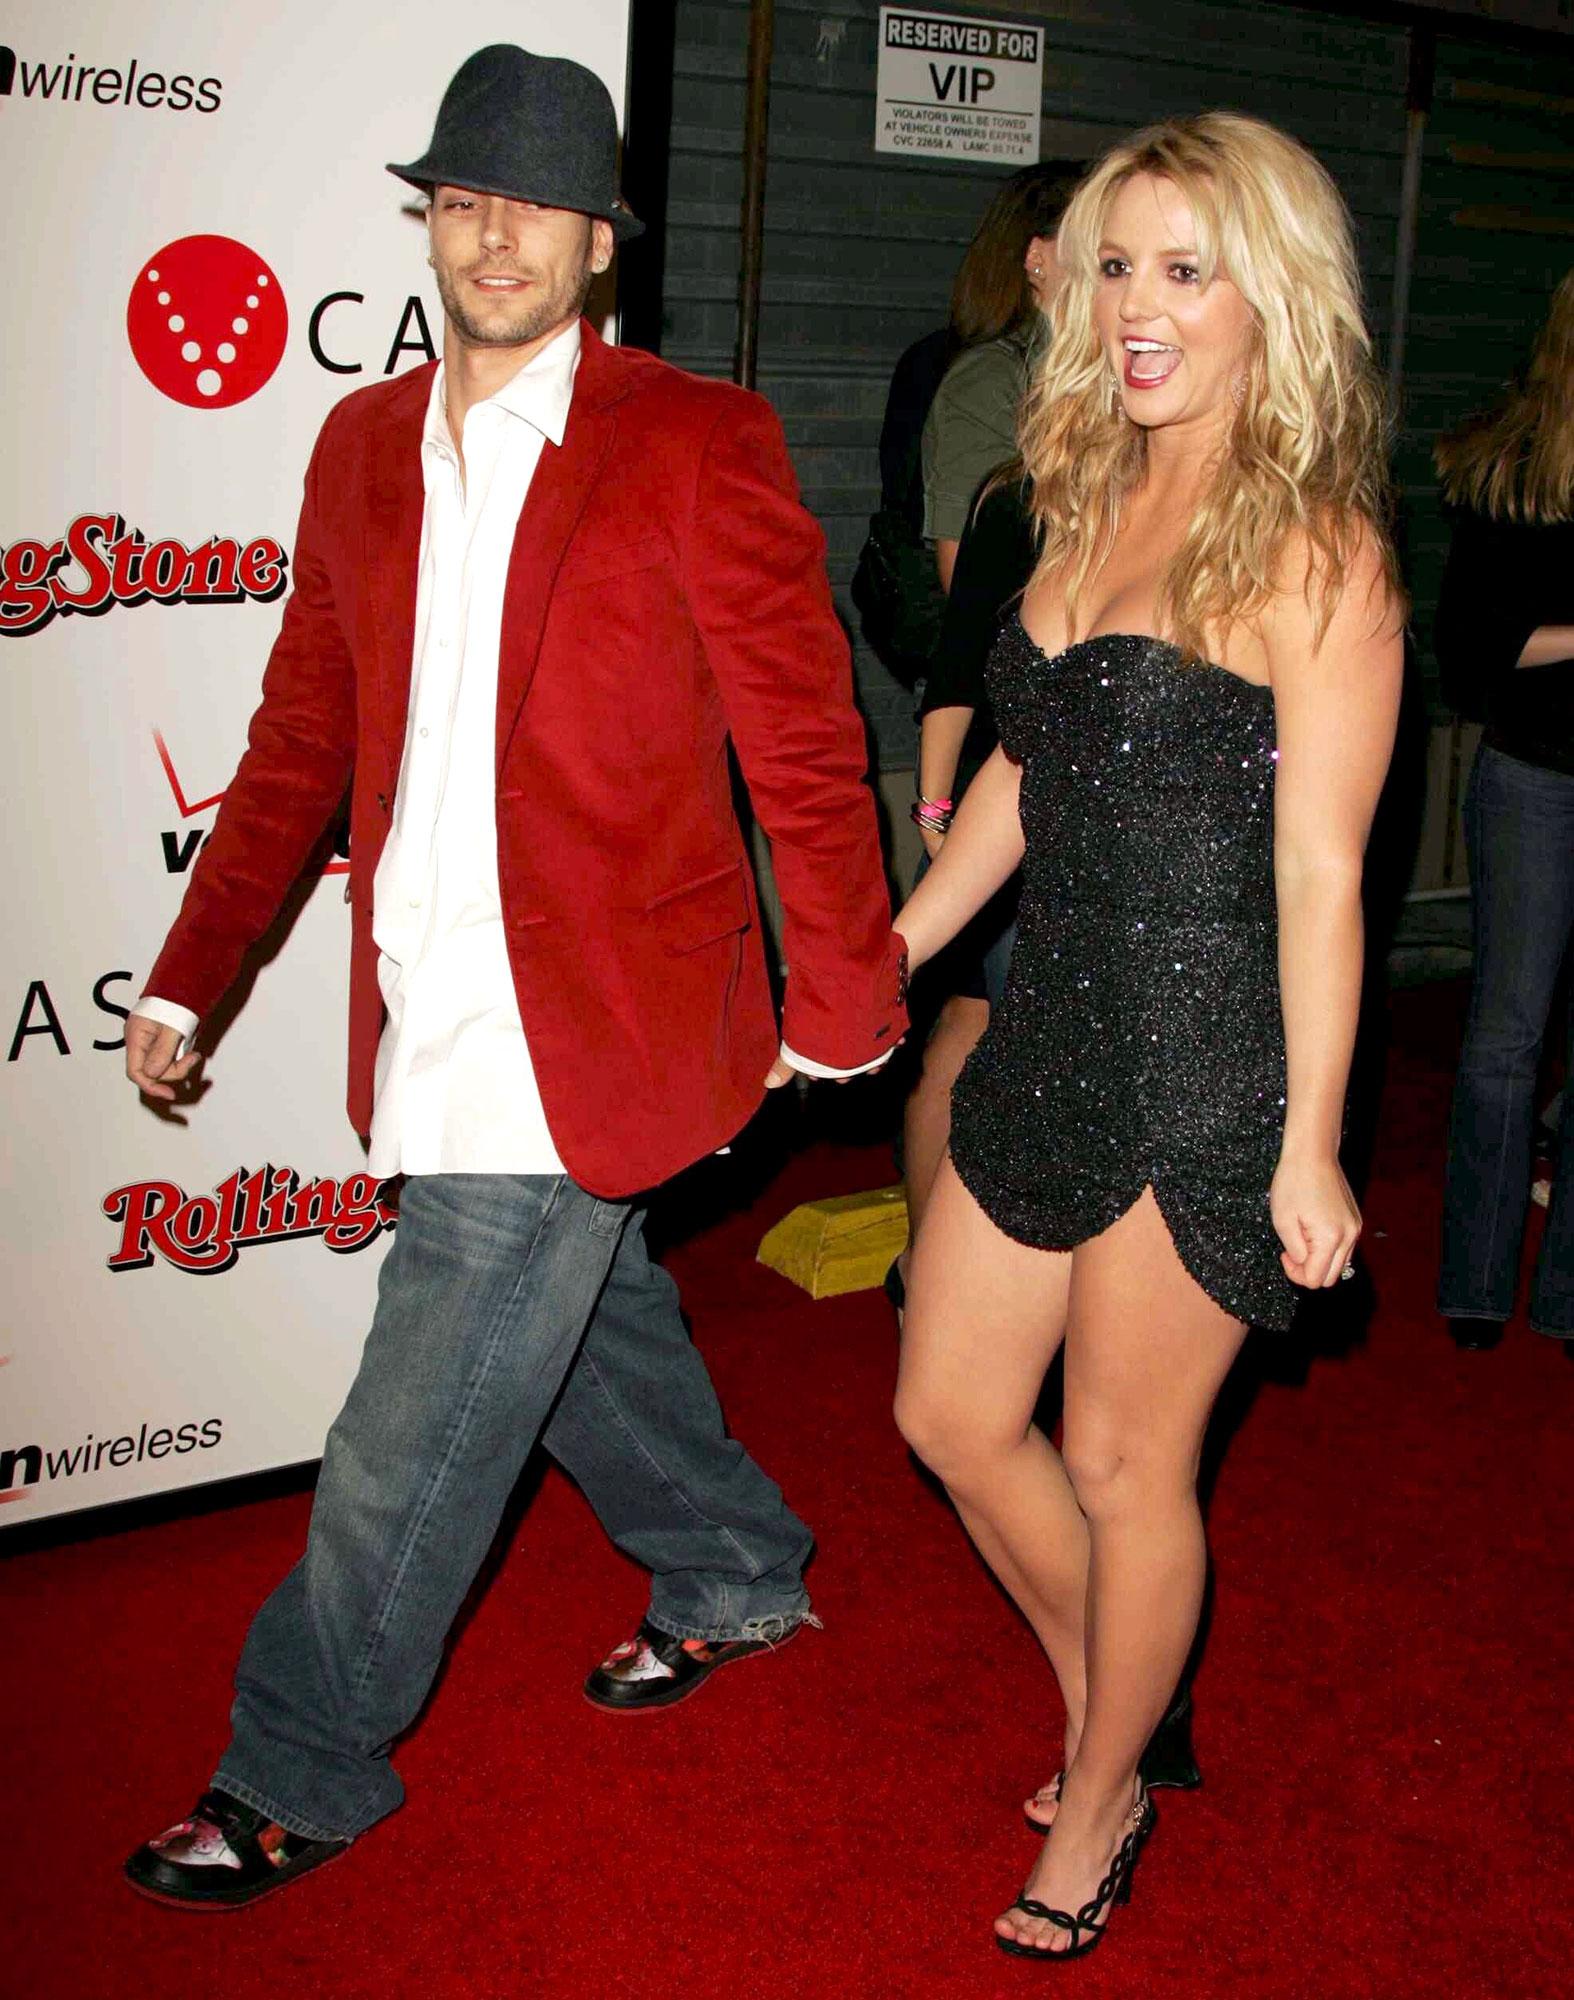 Britney Spears and Kevin Federline Surprise Wedding